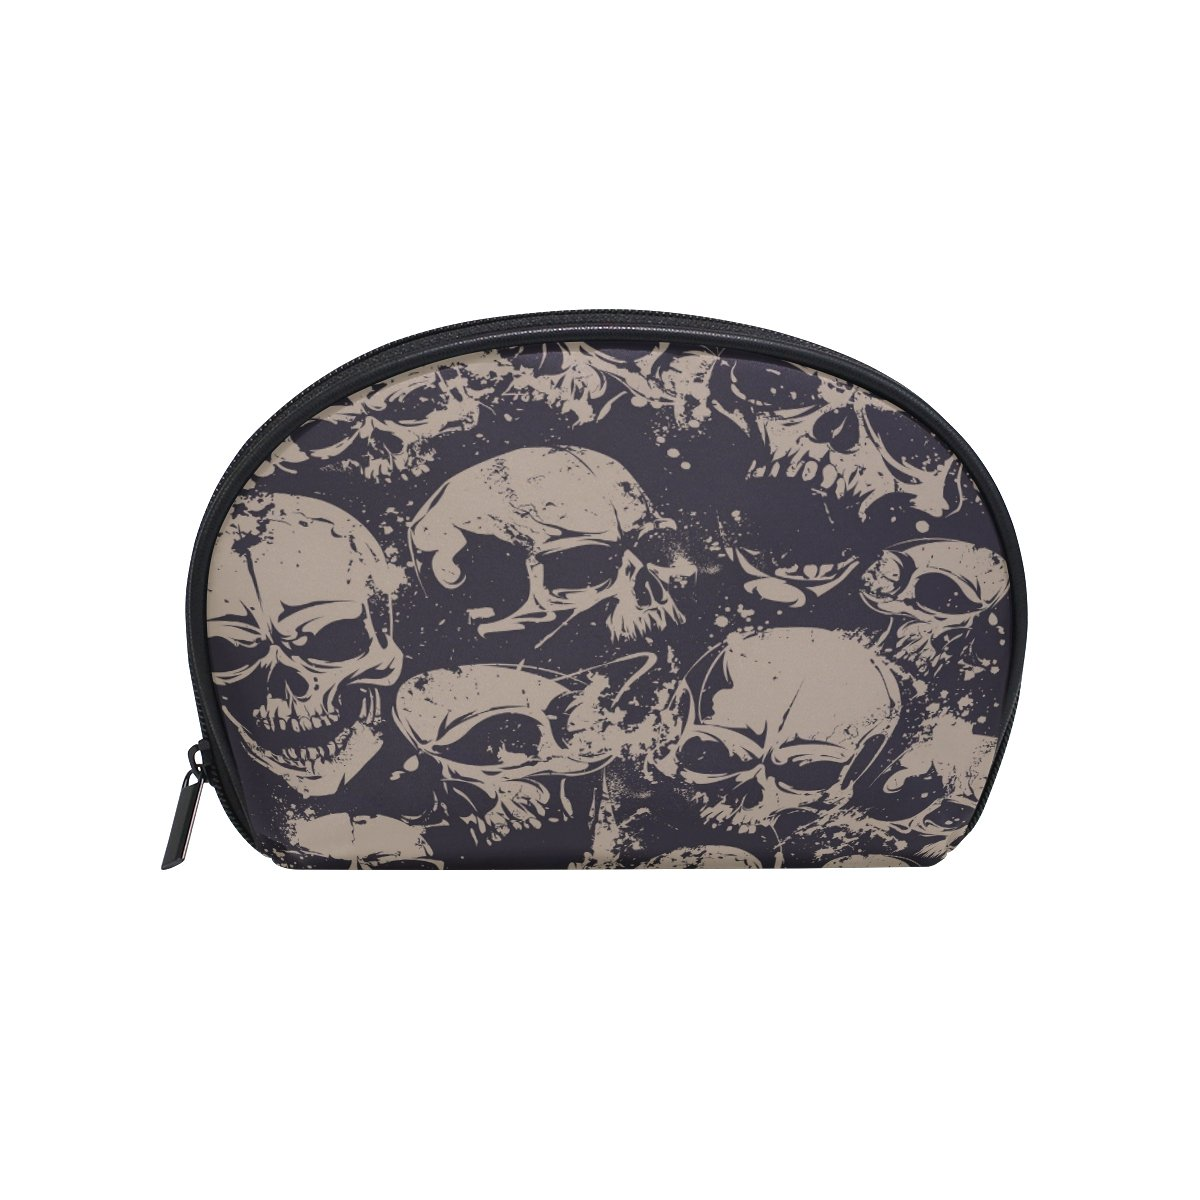 ALAZA Retro Skull Half Moon Cosmetic Makeup Toiletry Bag Pouch Travel Handy Purse Organizer Bag for Women Girls